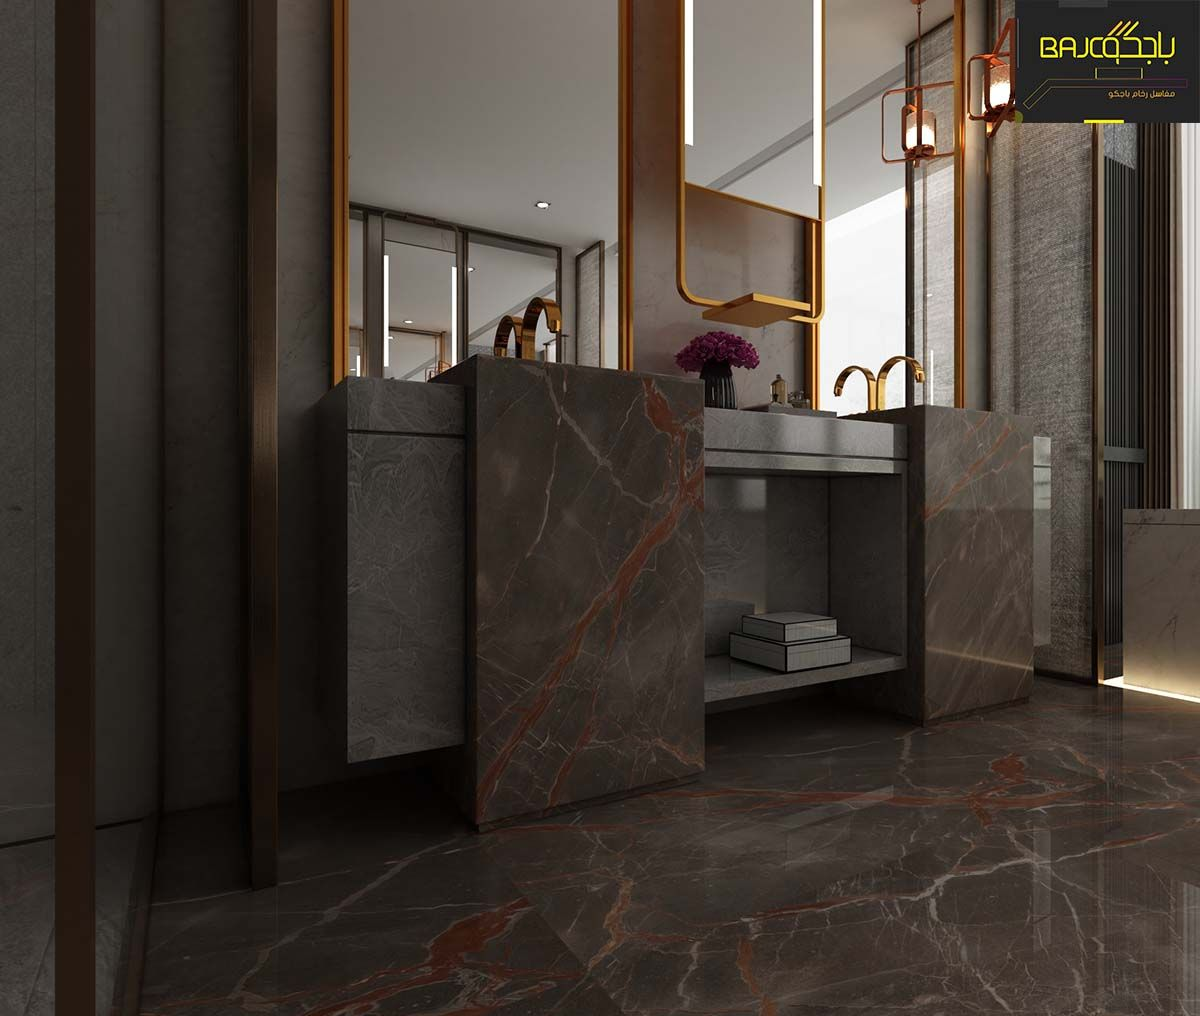 مغاسل حمامات Home Decor Decor Room Divider